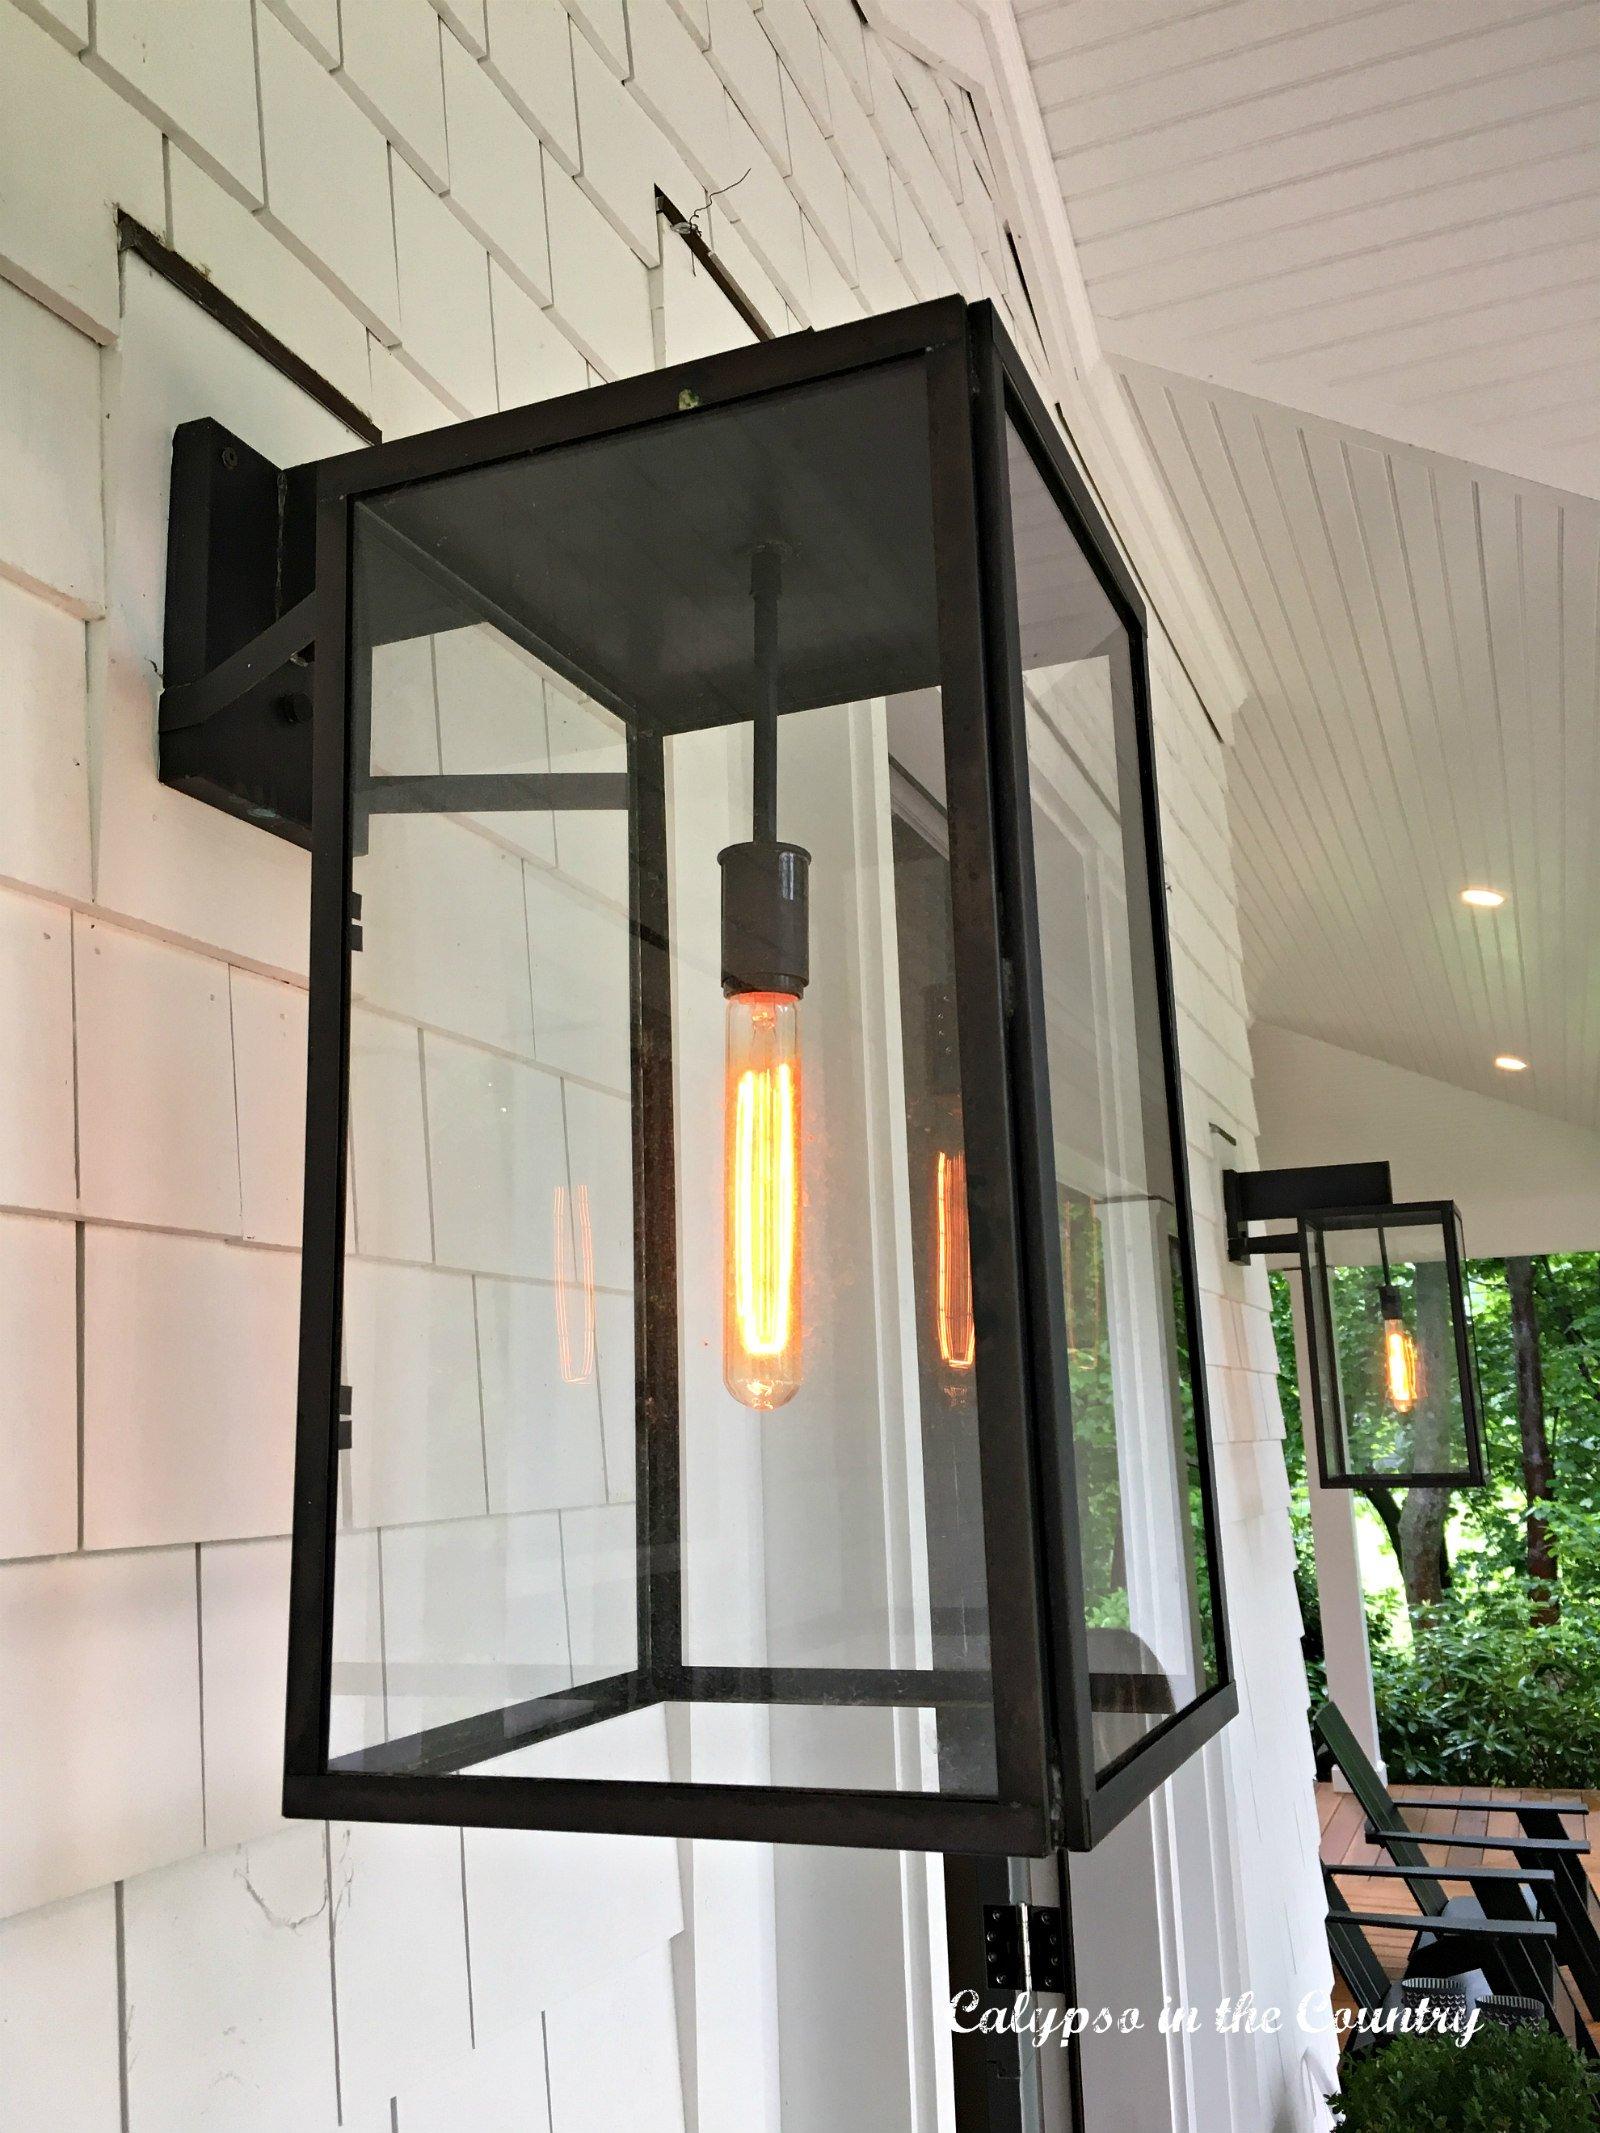 Popular Design Trends Seen on a House Tour